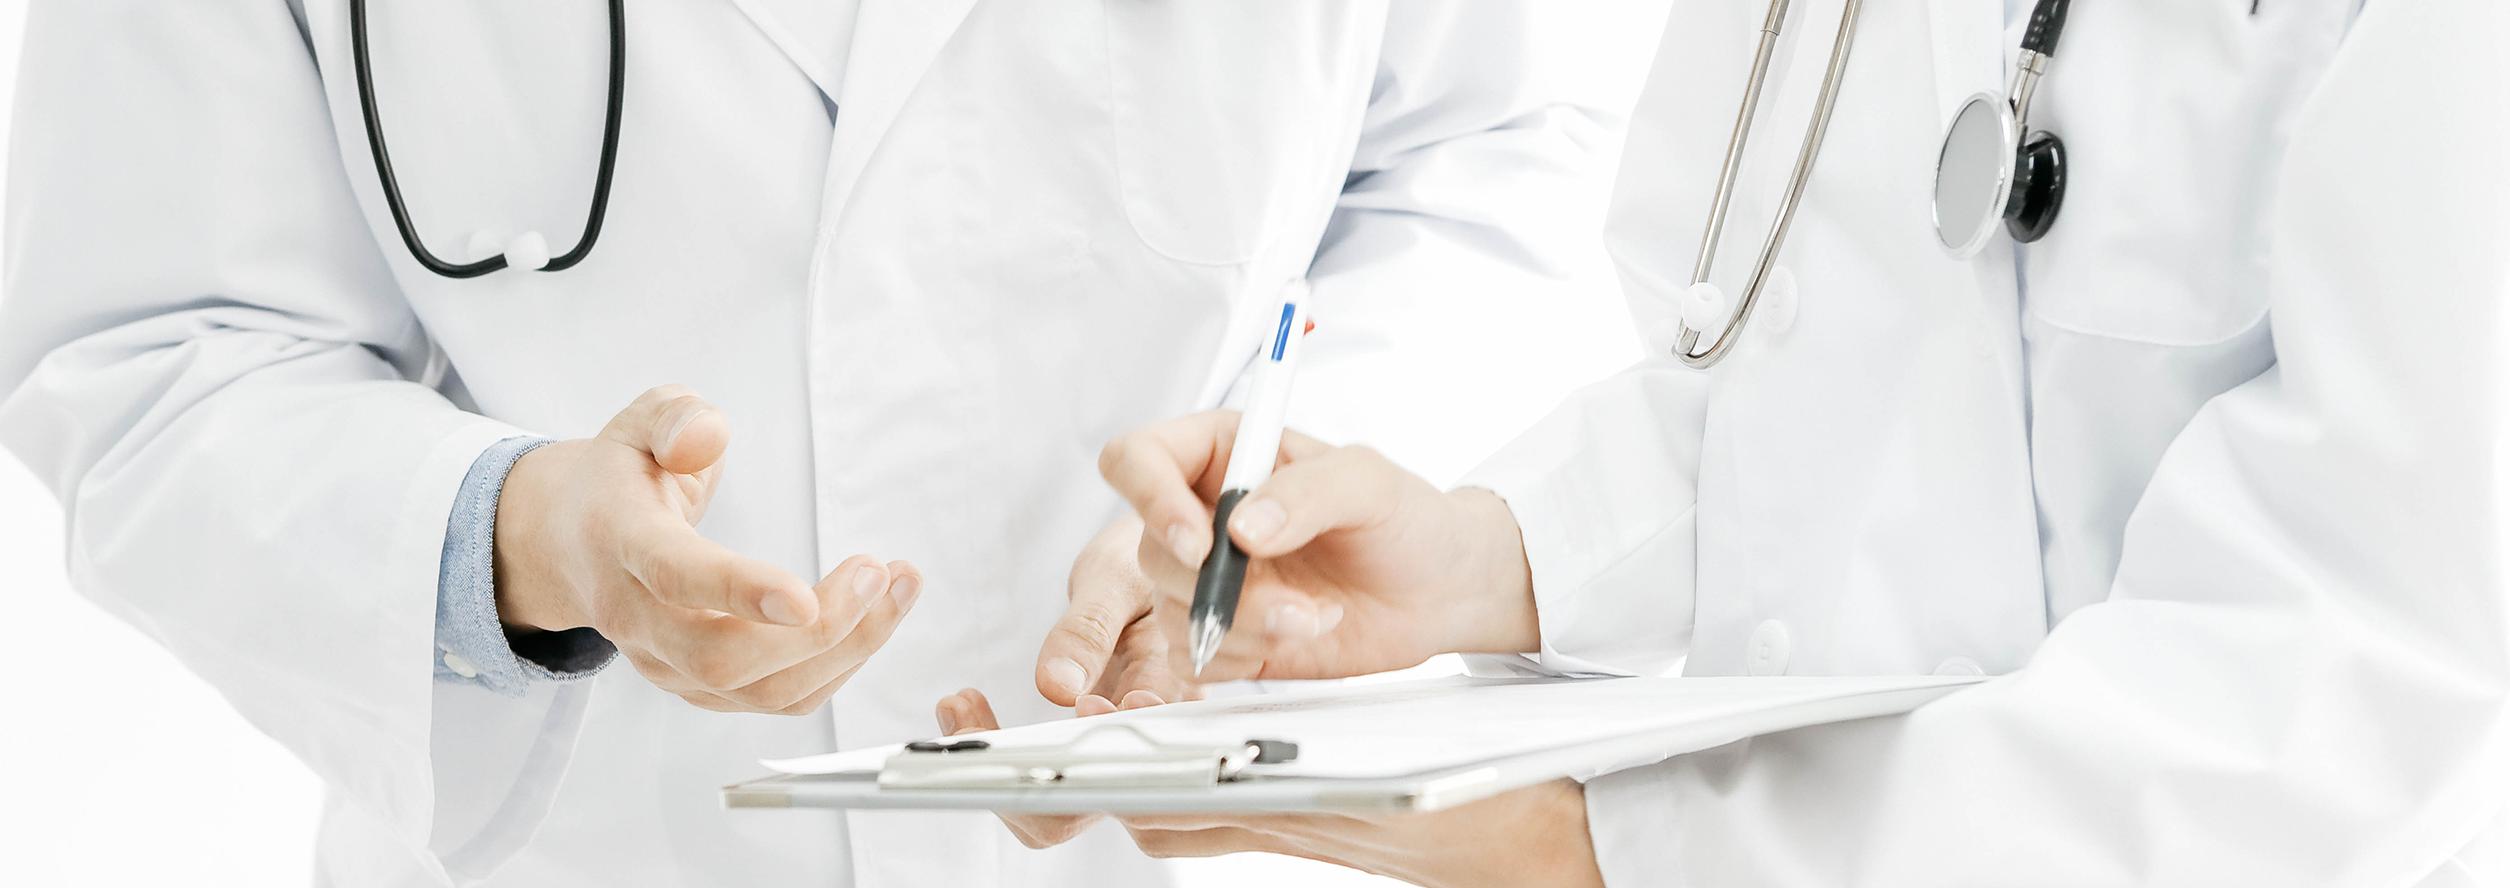 医療機器保守料金コスト削減